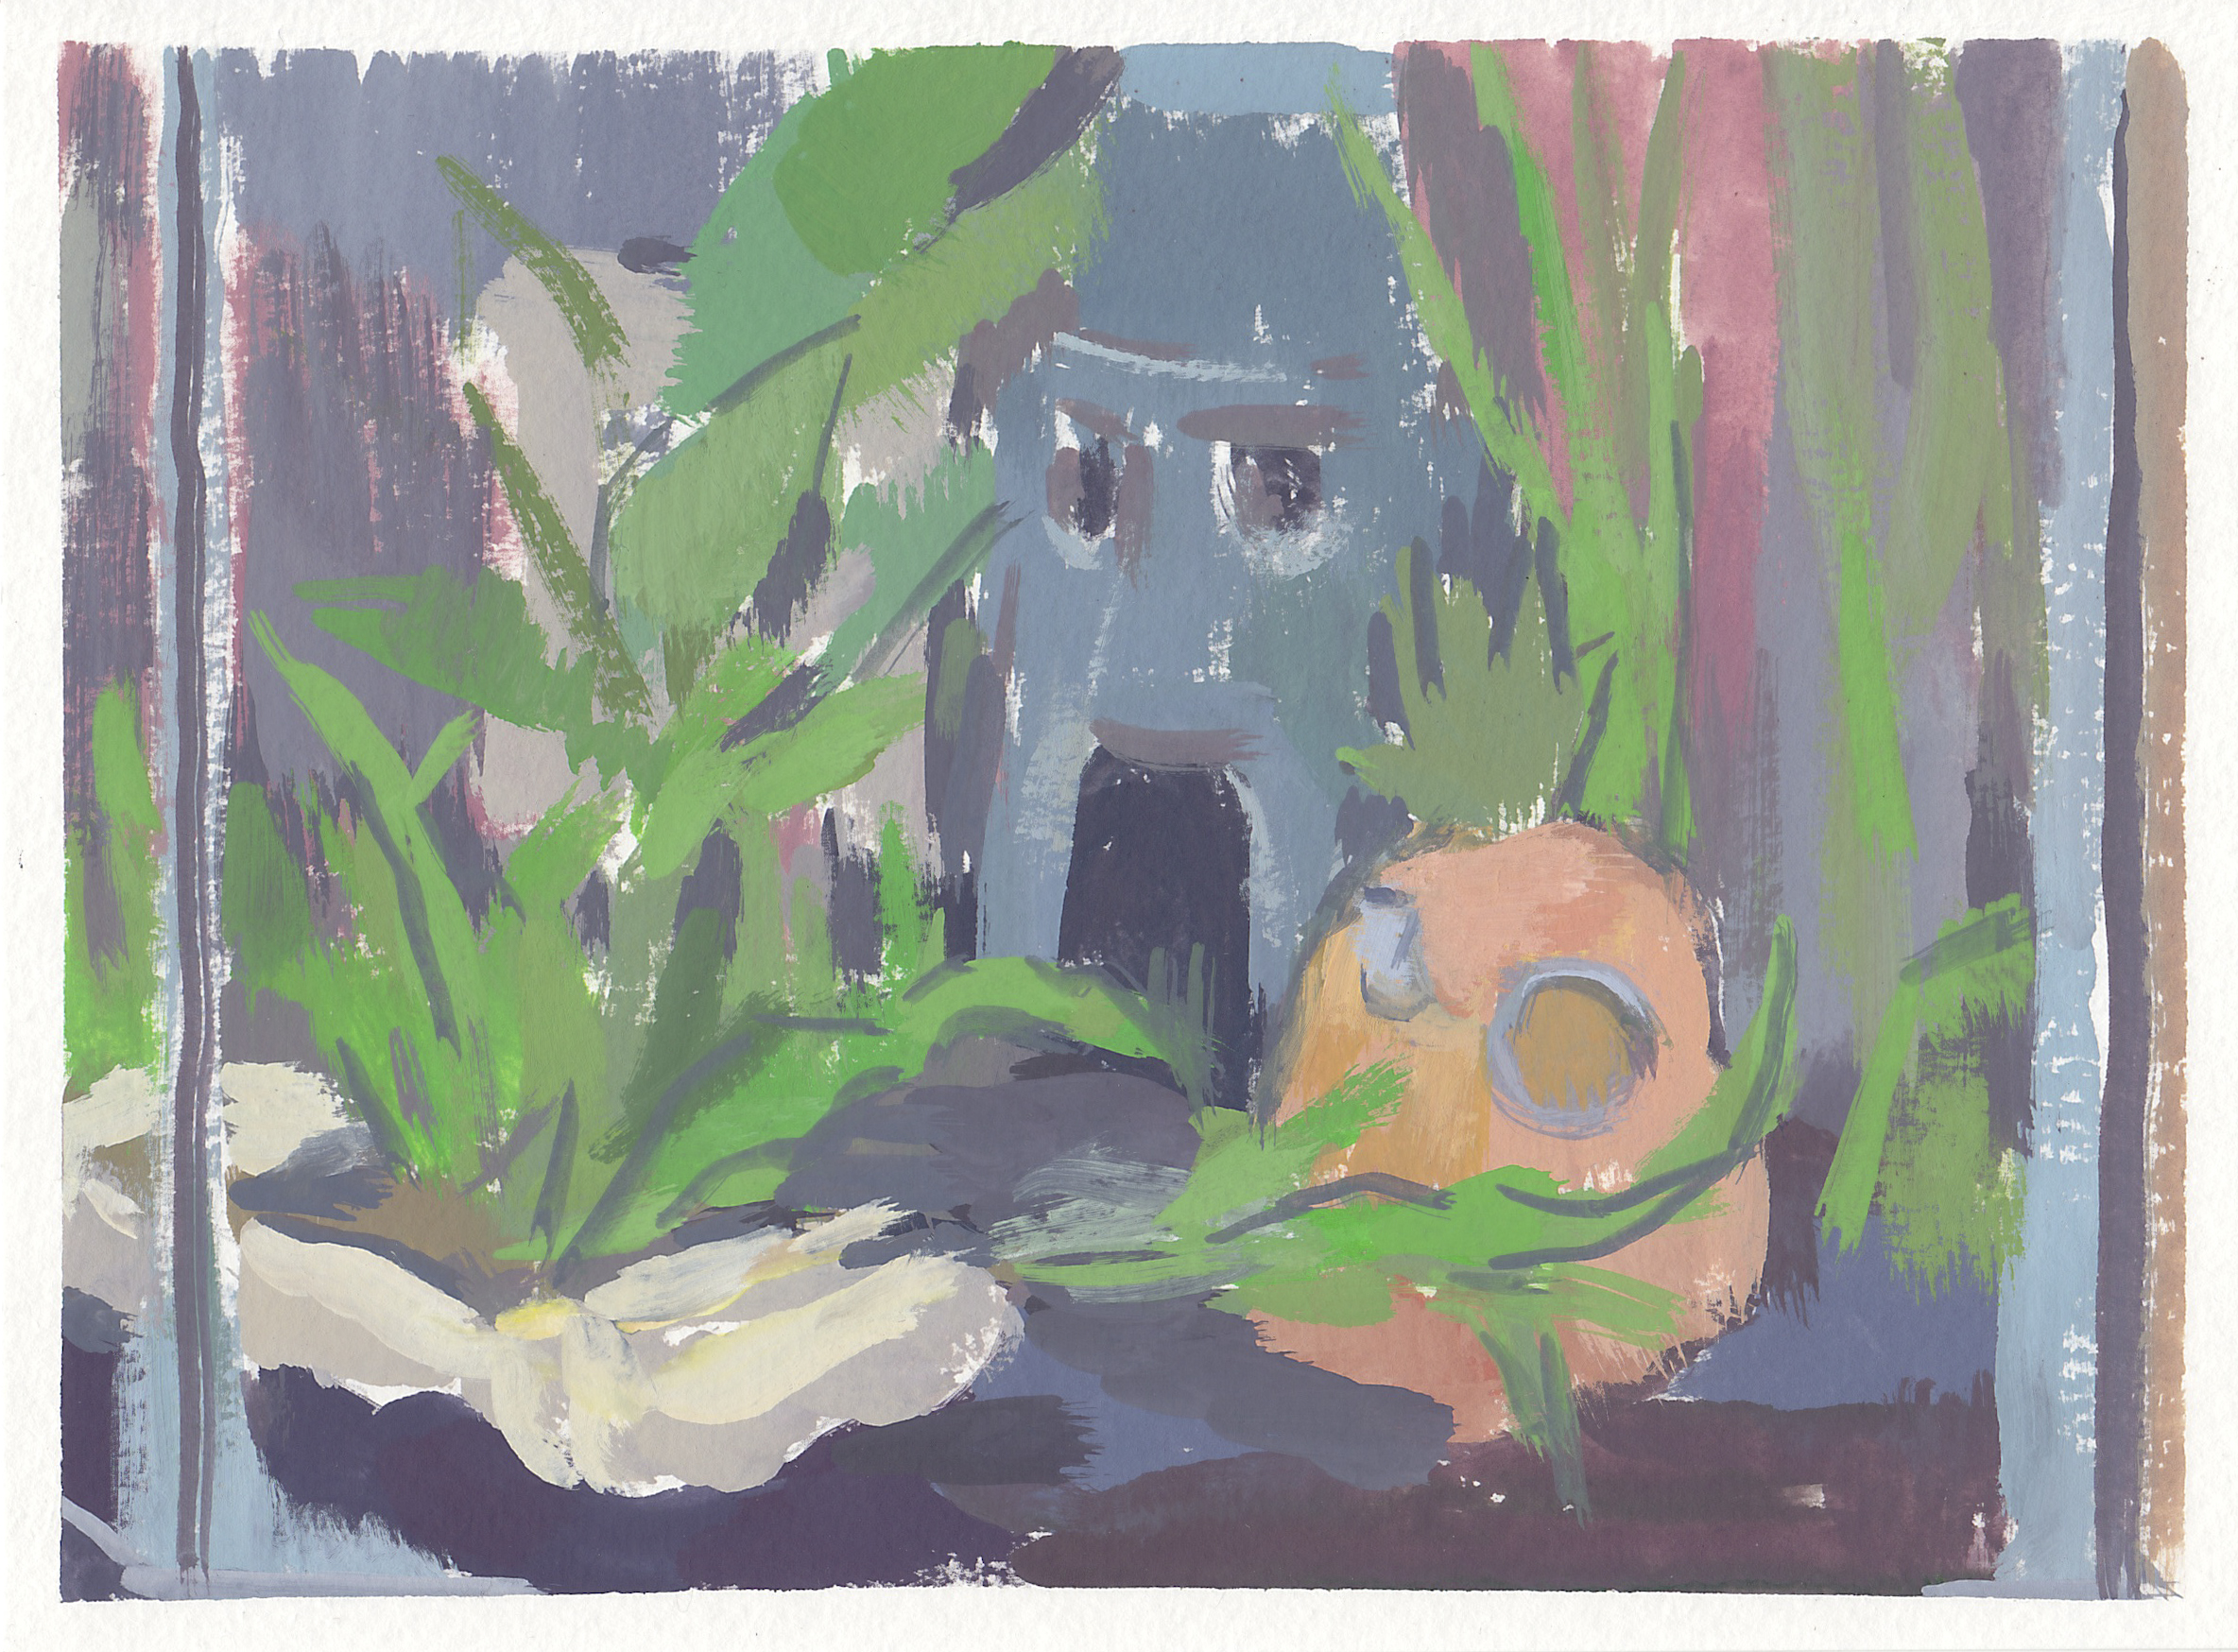 "spongbob fish tank   gouache on paper  7.5x5.5""  2017"